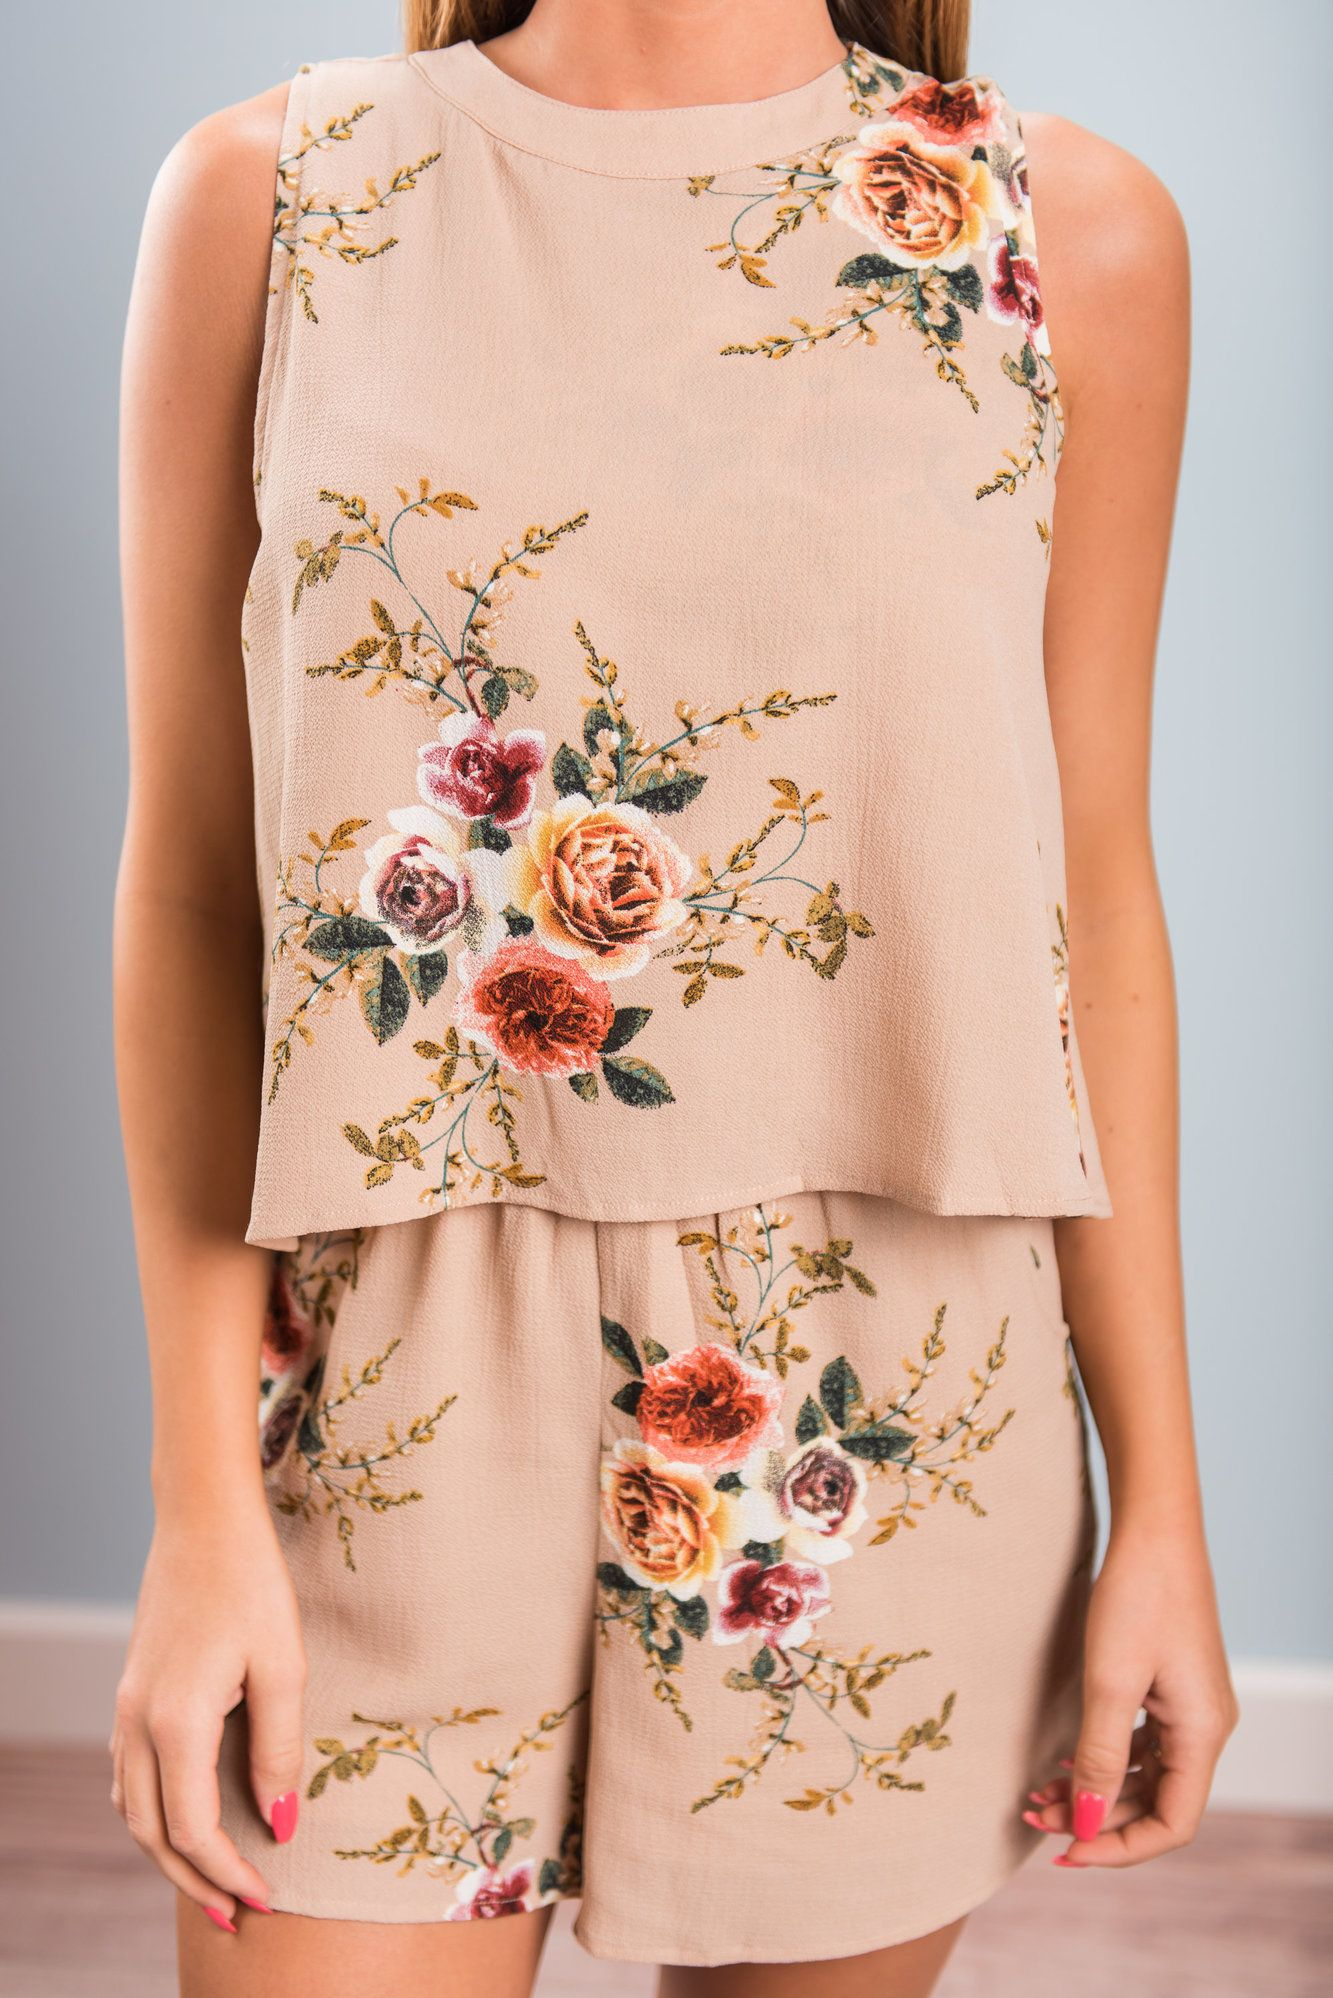 New dresses maxi dresses cute rompers shoes u more the mint